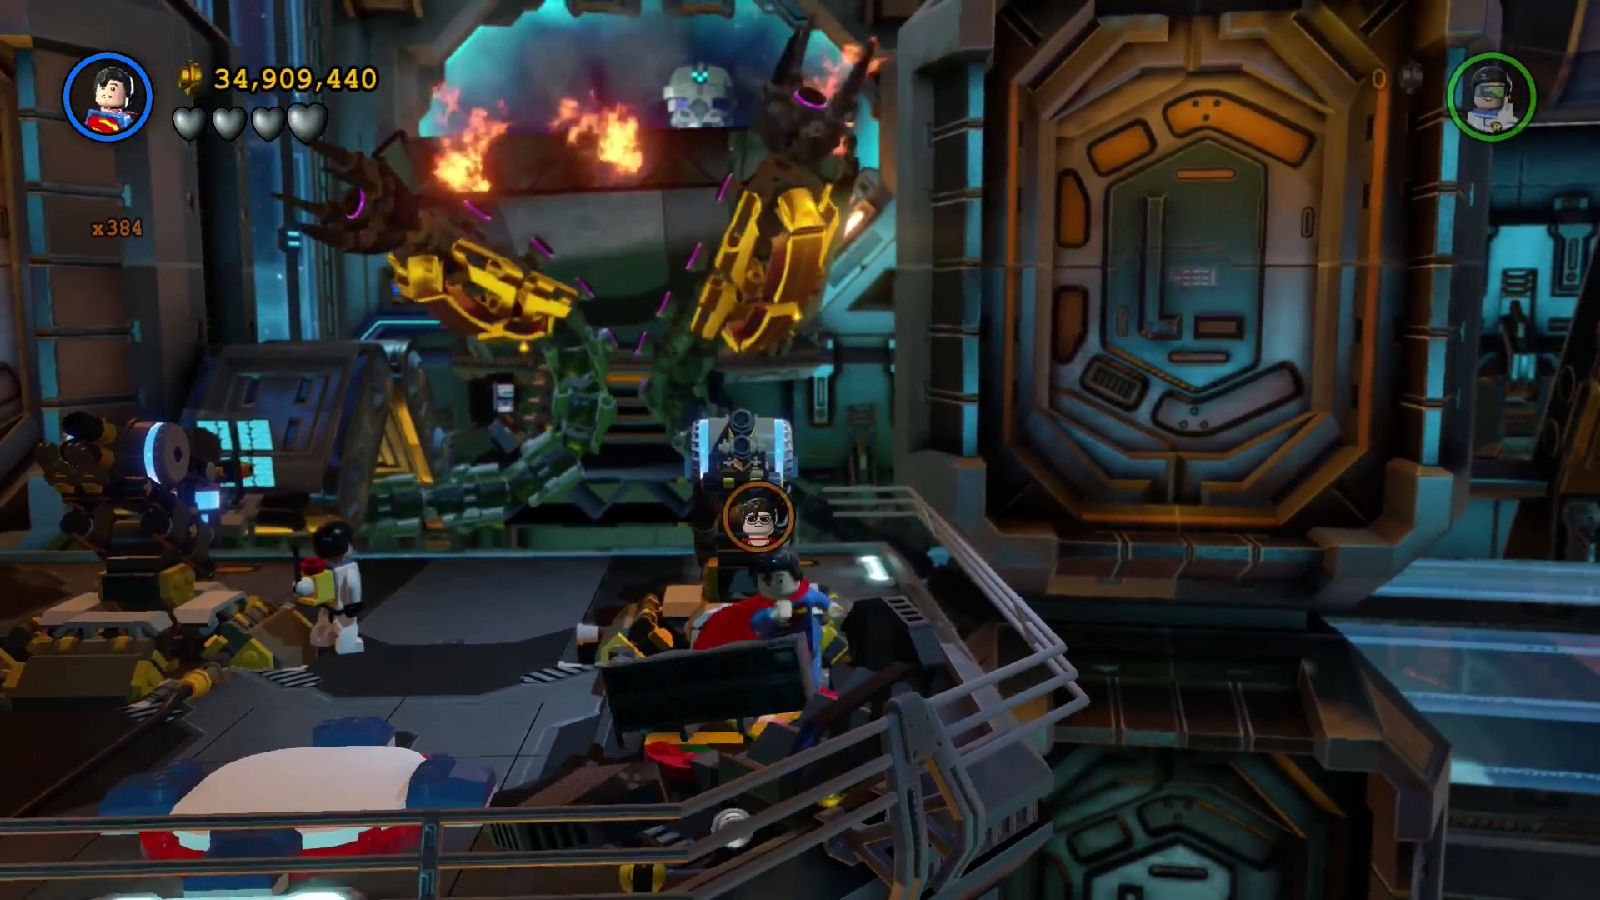 Lego Batman 3 Red Brick 5: Studs x10 Location